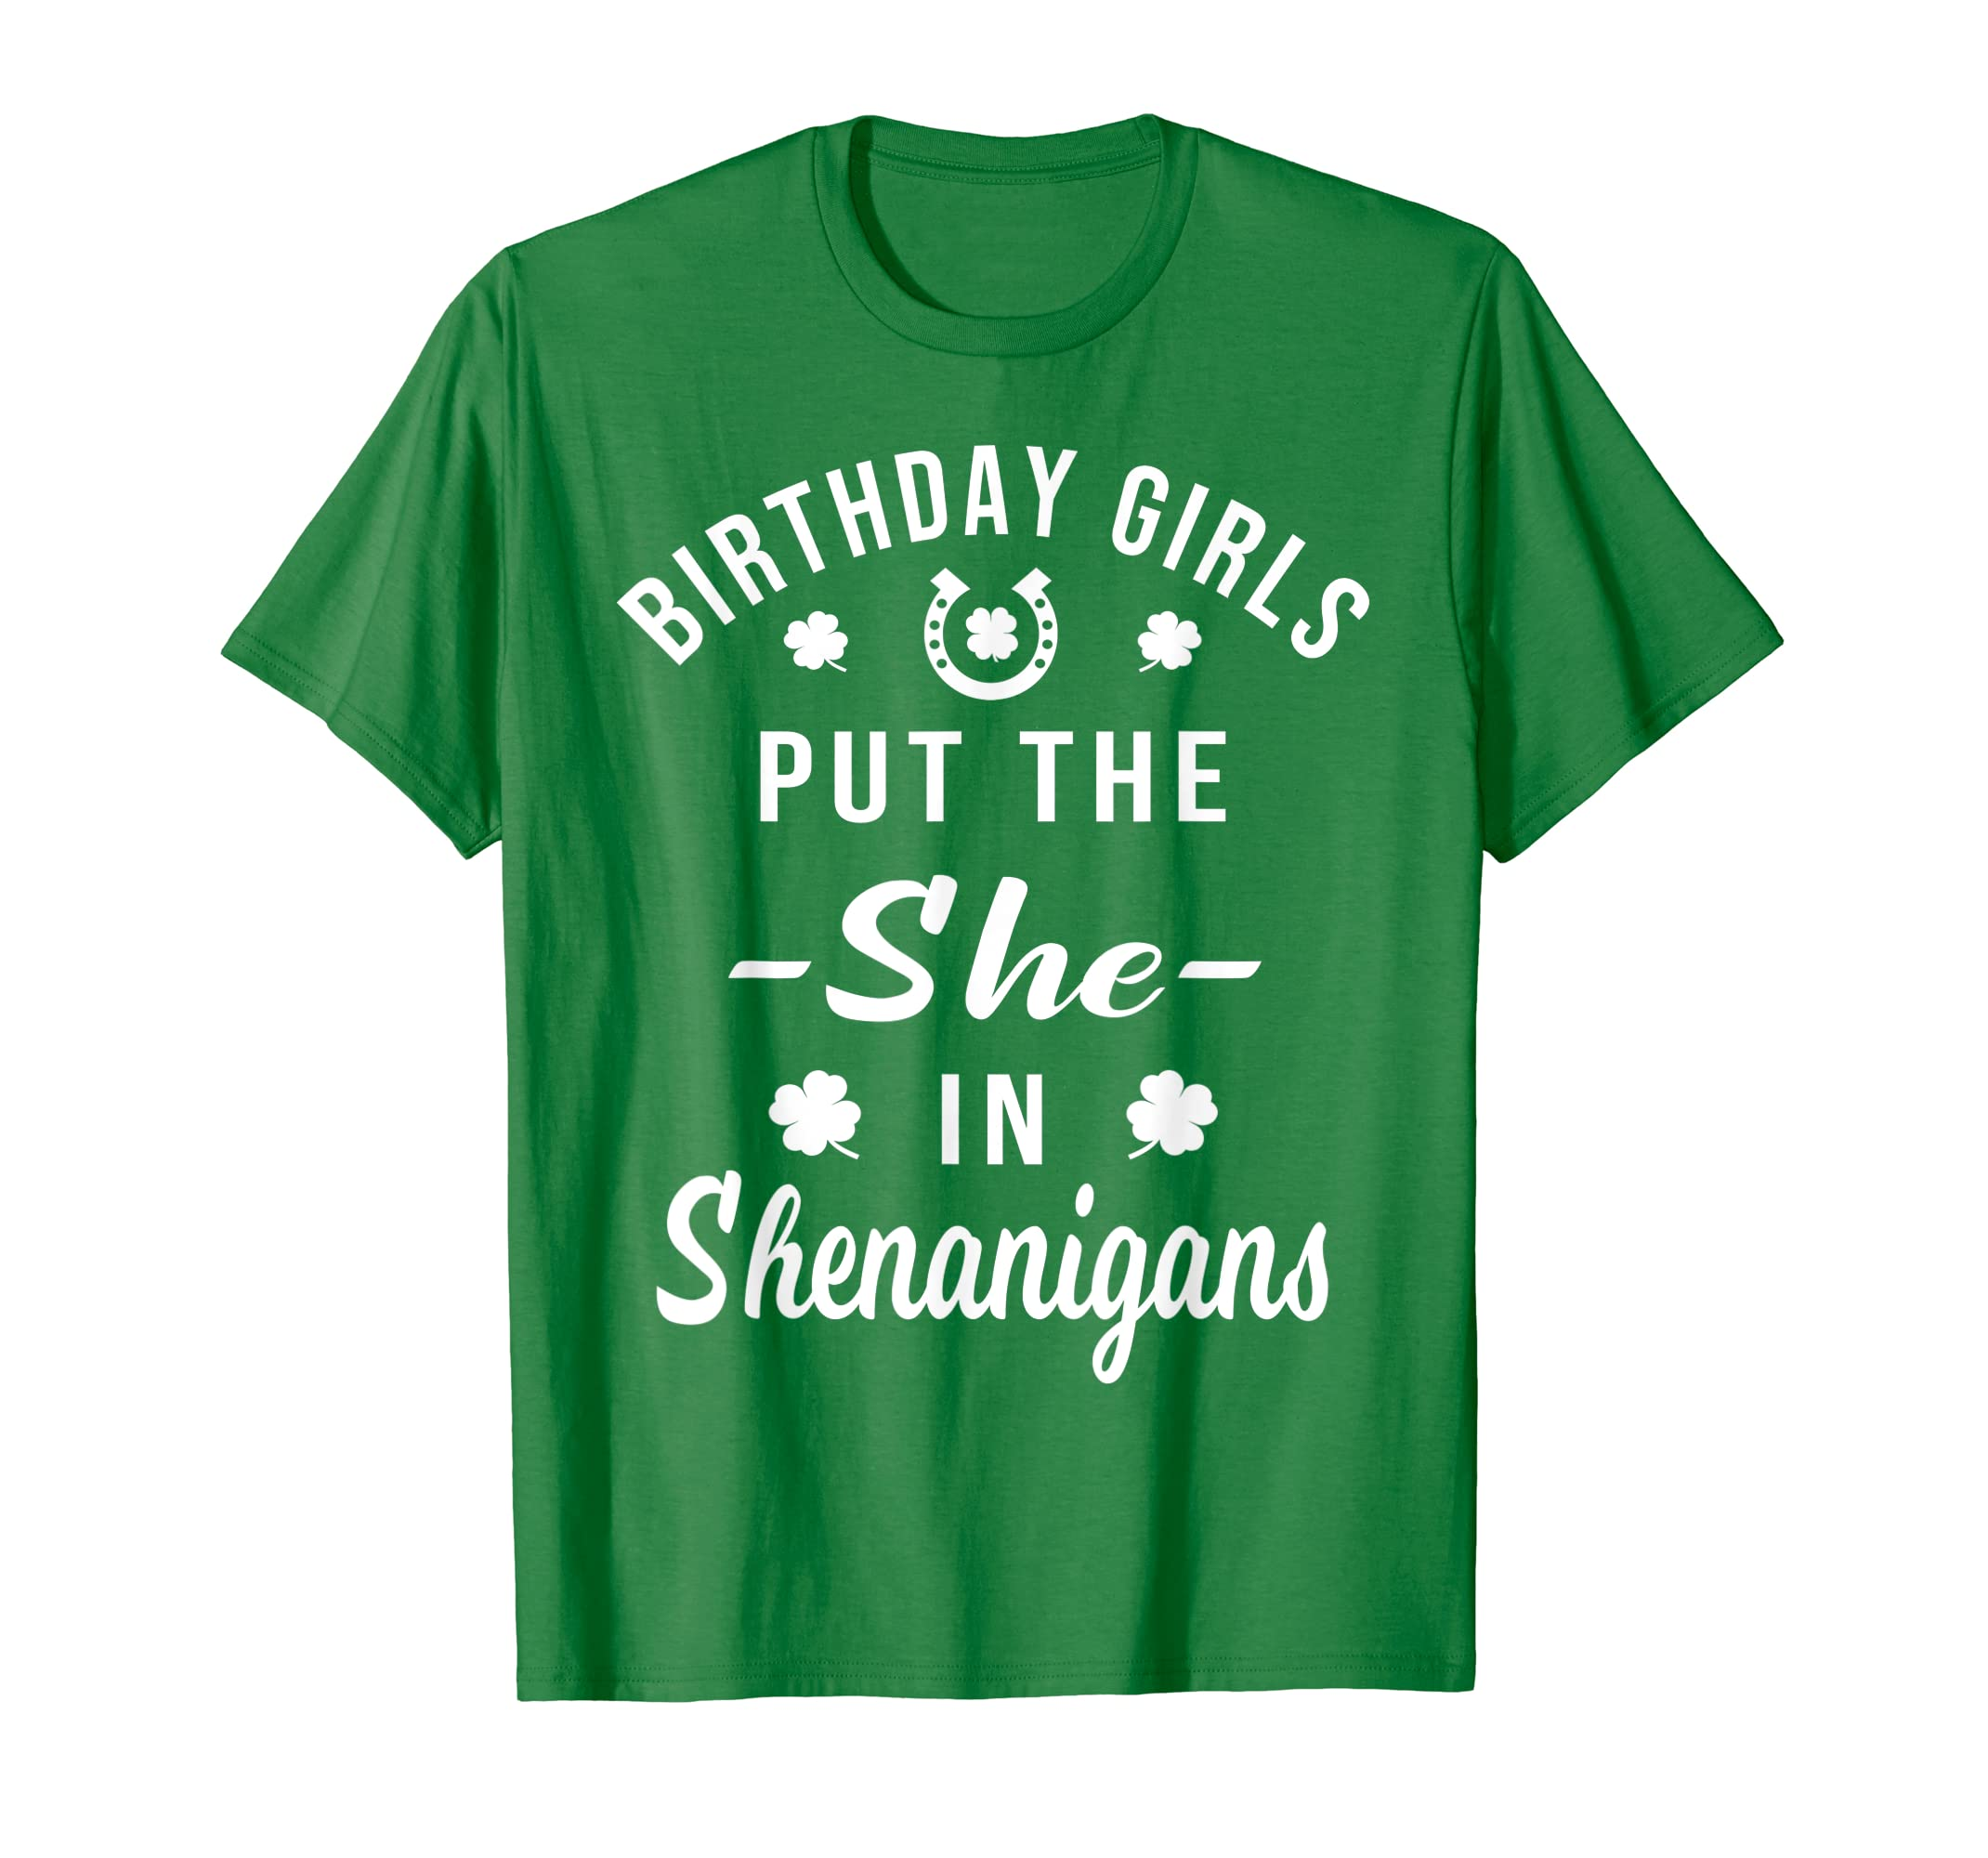 4608dcc93 Amazon.com: Birthday Girls Put She in Shenanigans St Patricks T Shirt:  Clothing